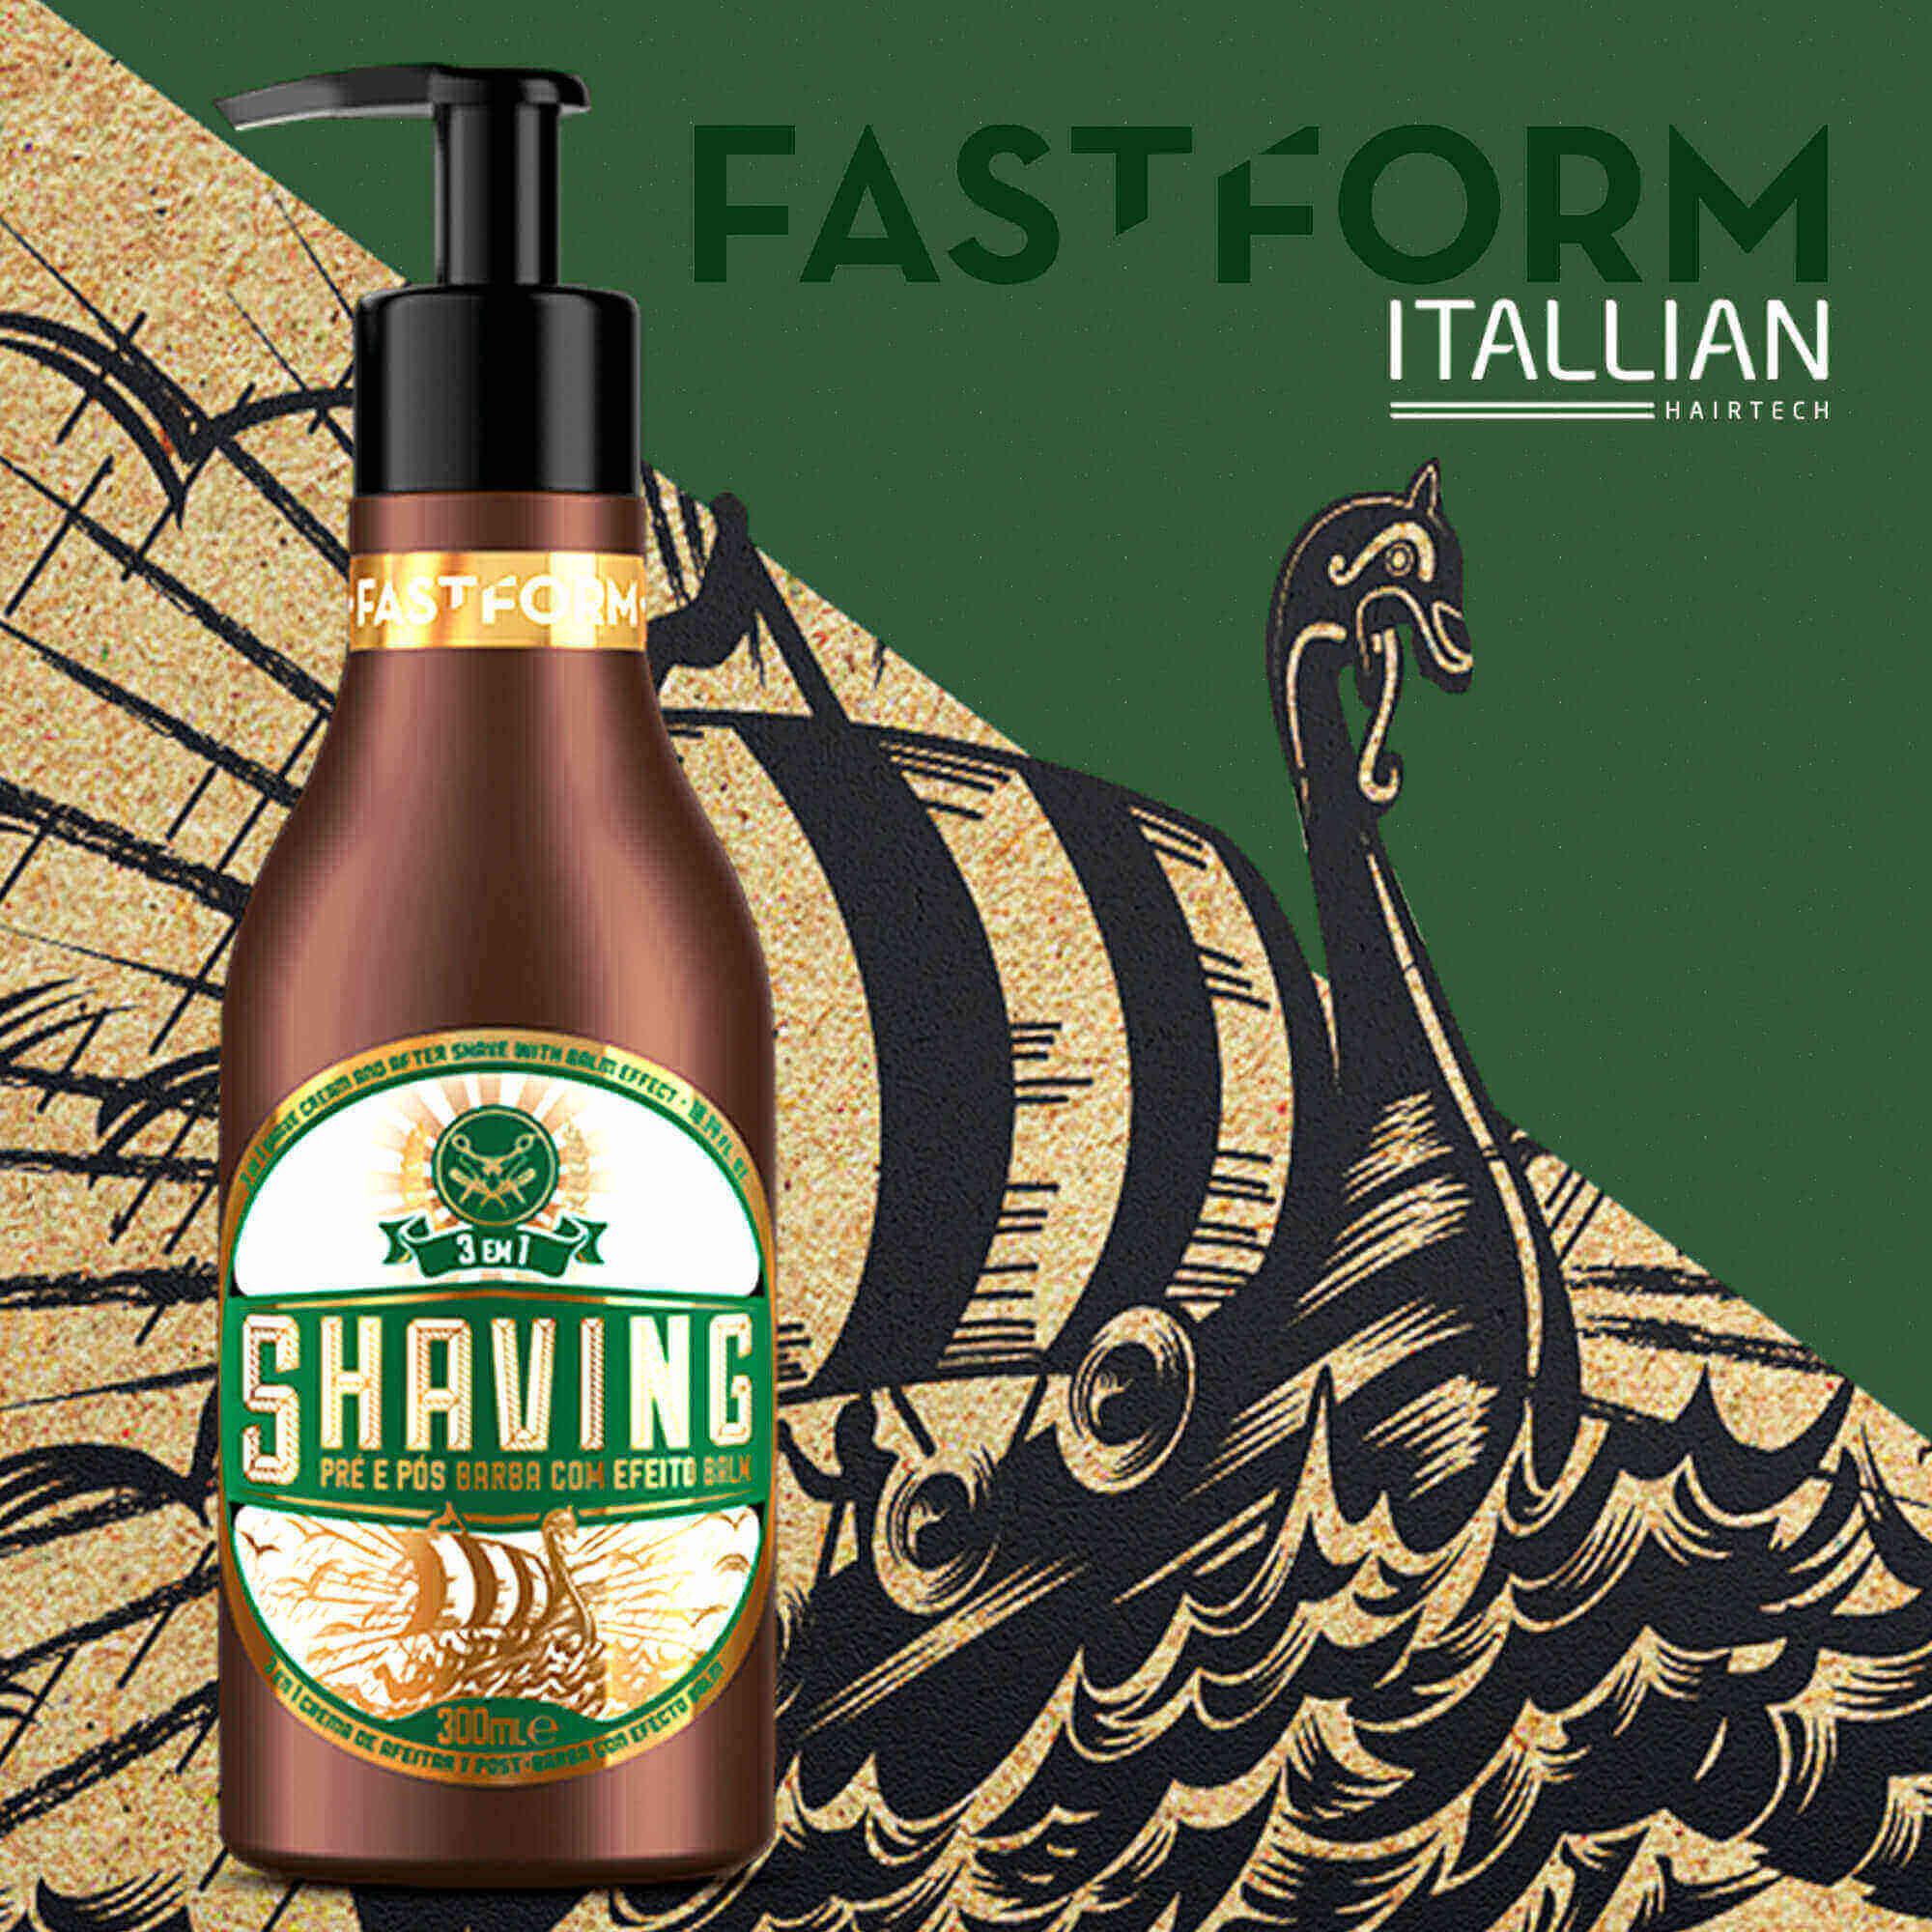 Itallian Shaving 3 Em 1 Fastform 300ml